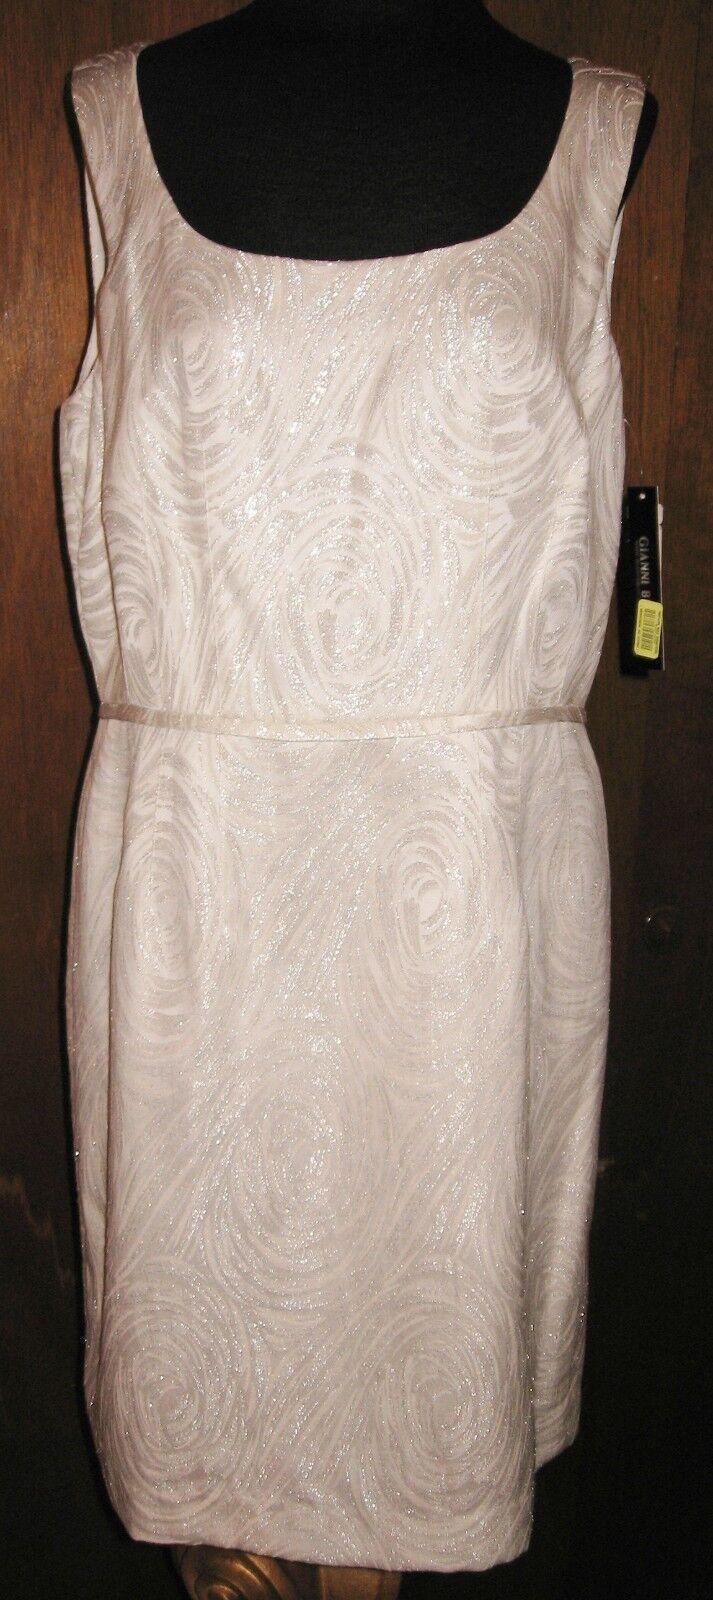 NWT GIANNI BiNI Ivory printed pencil dress size 12